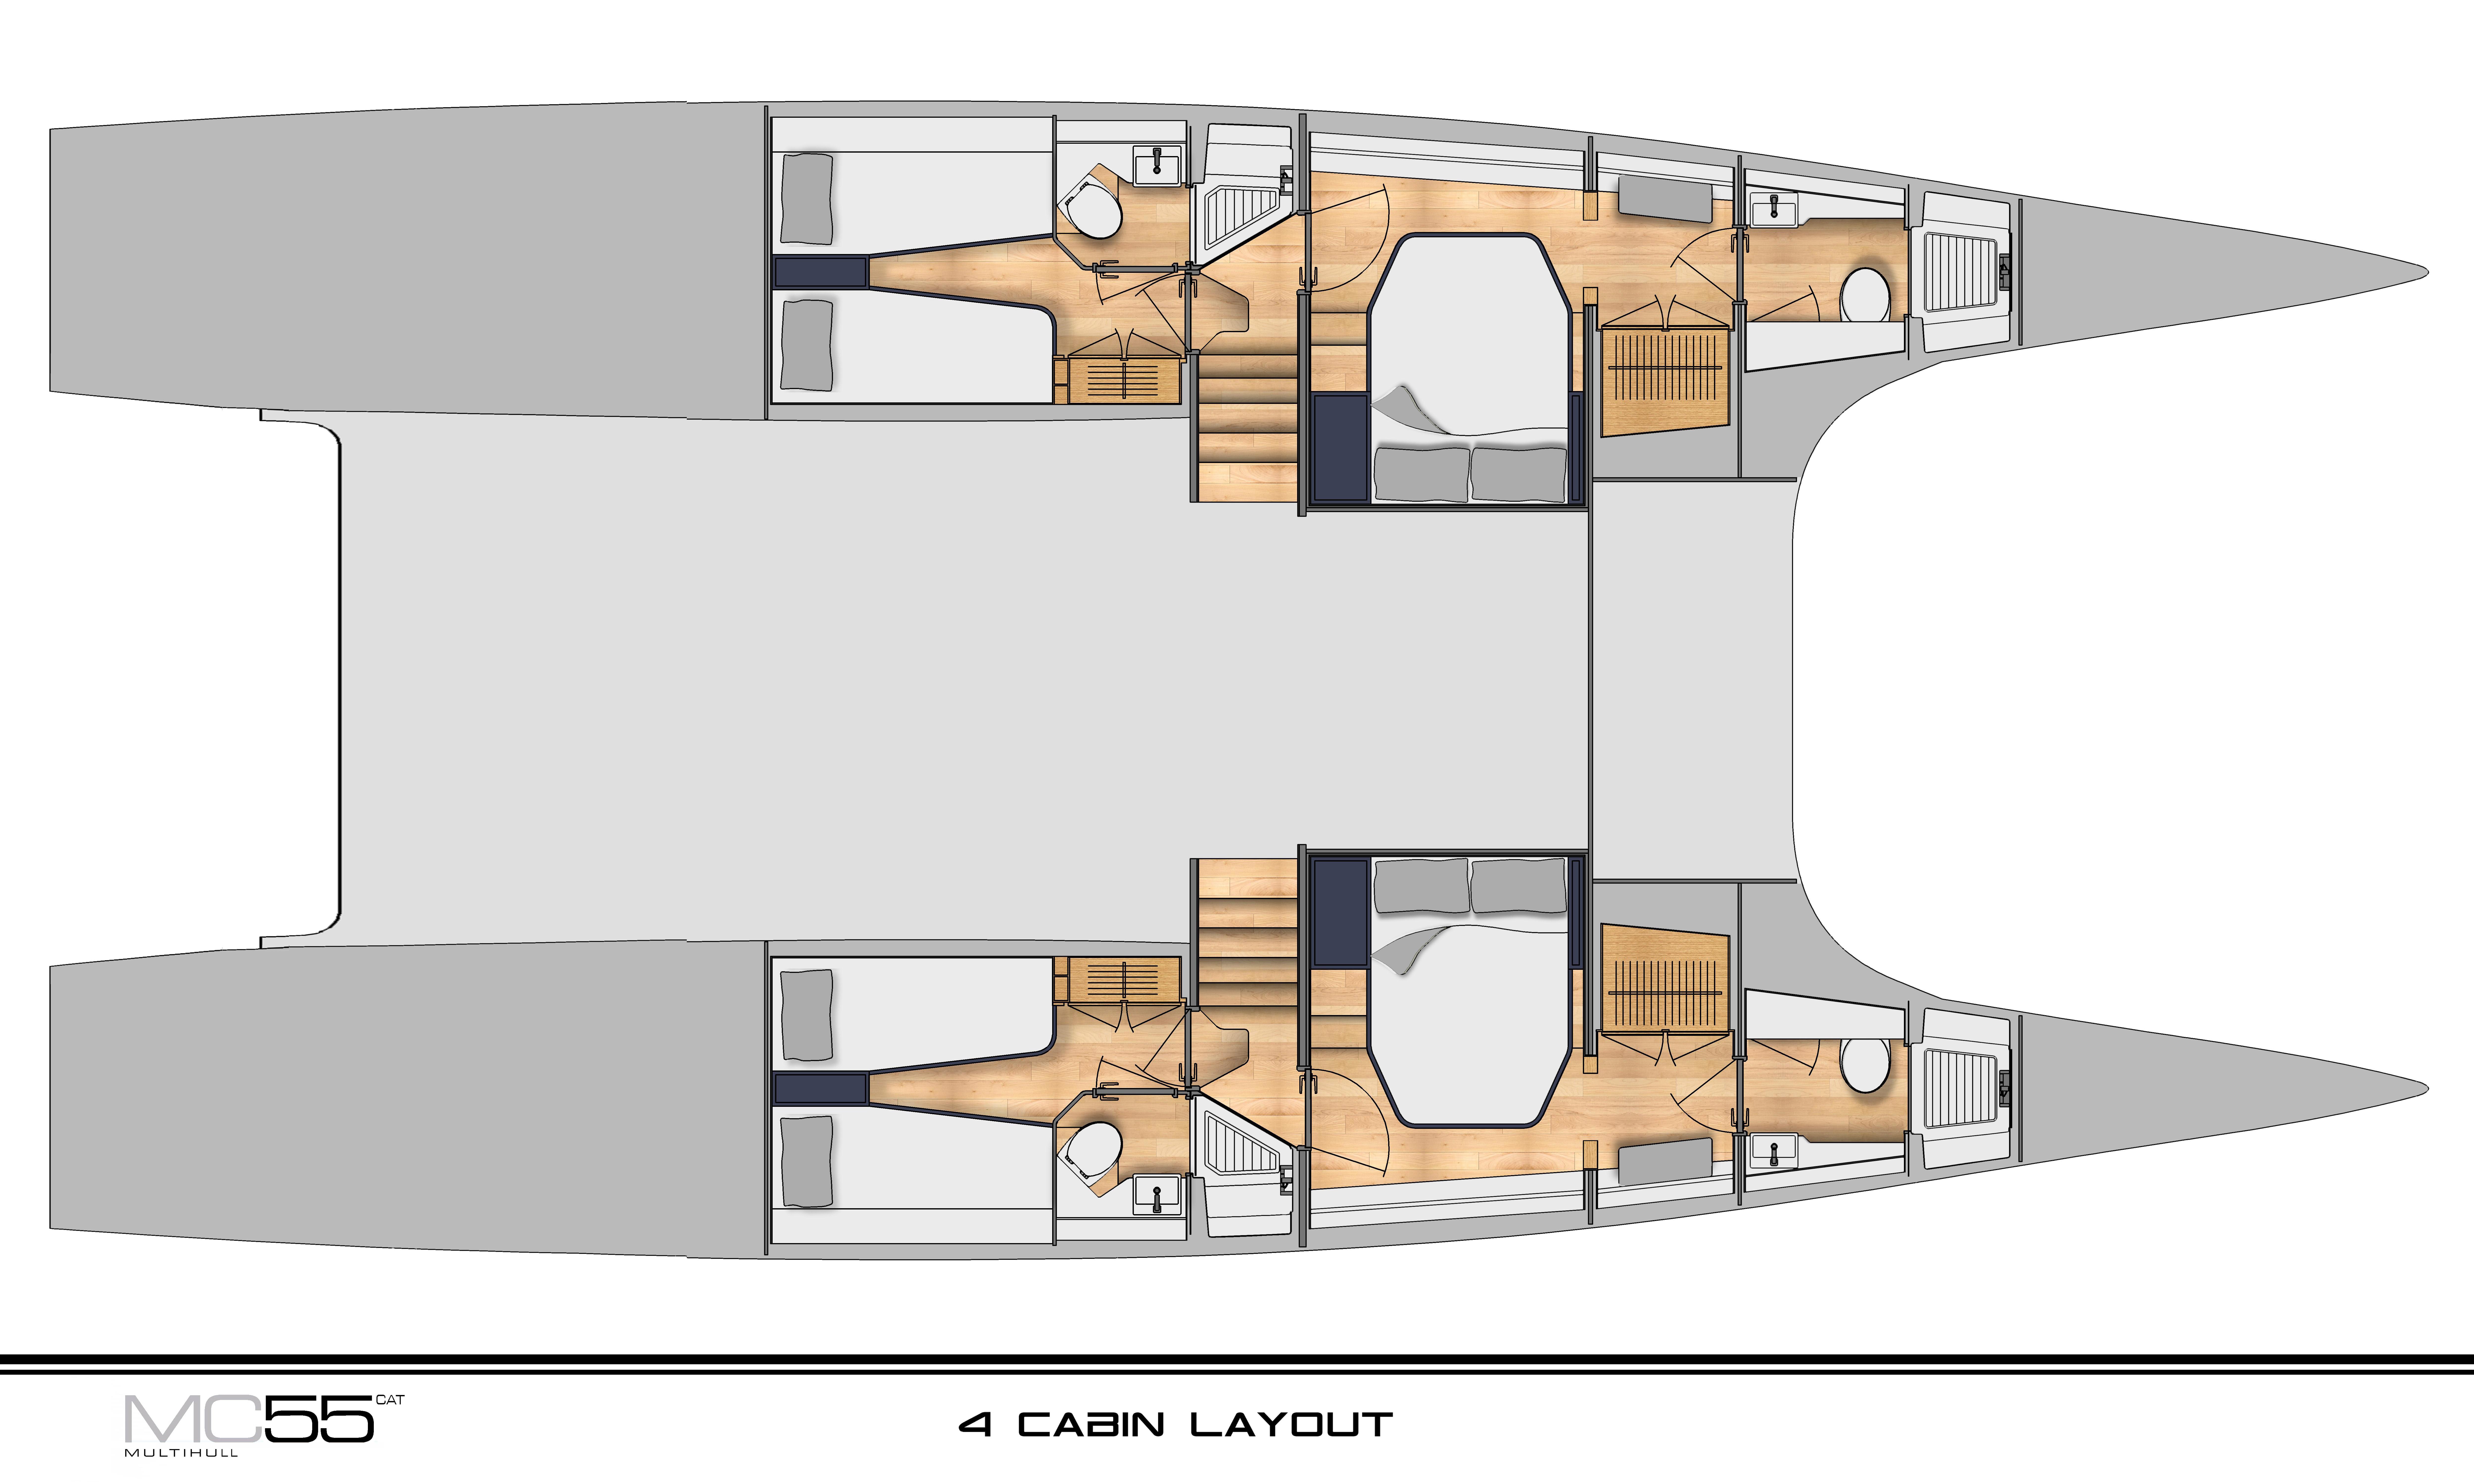 McConaghy 55 catamaran Layout